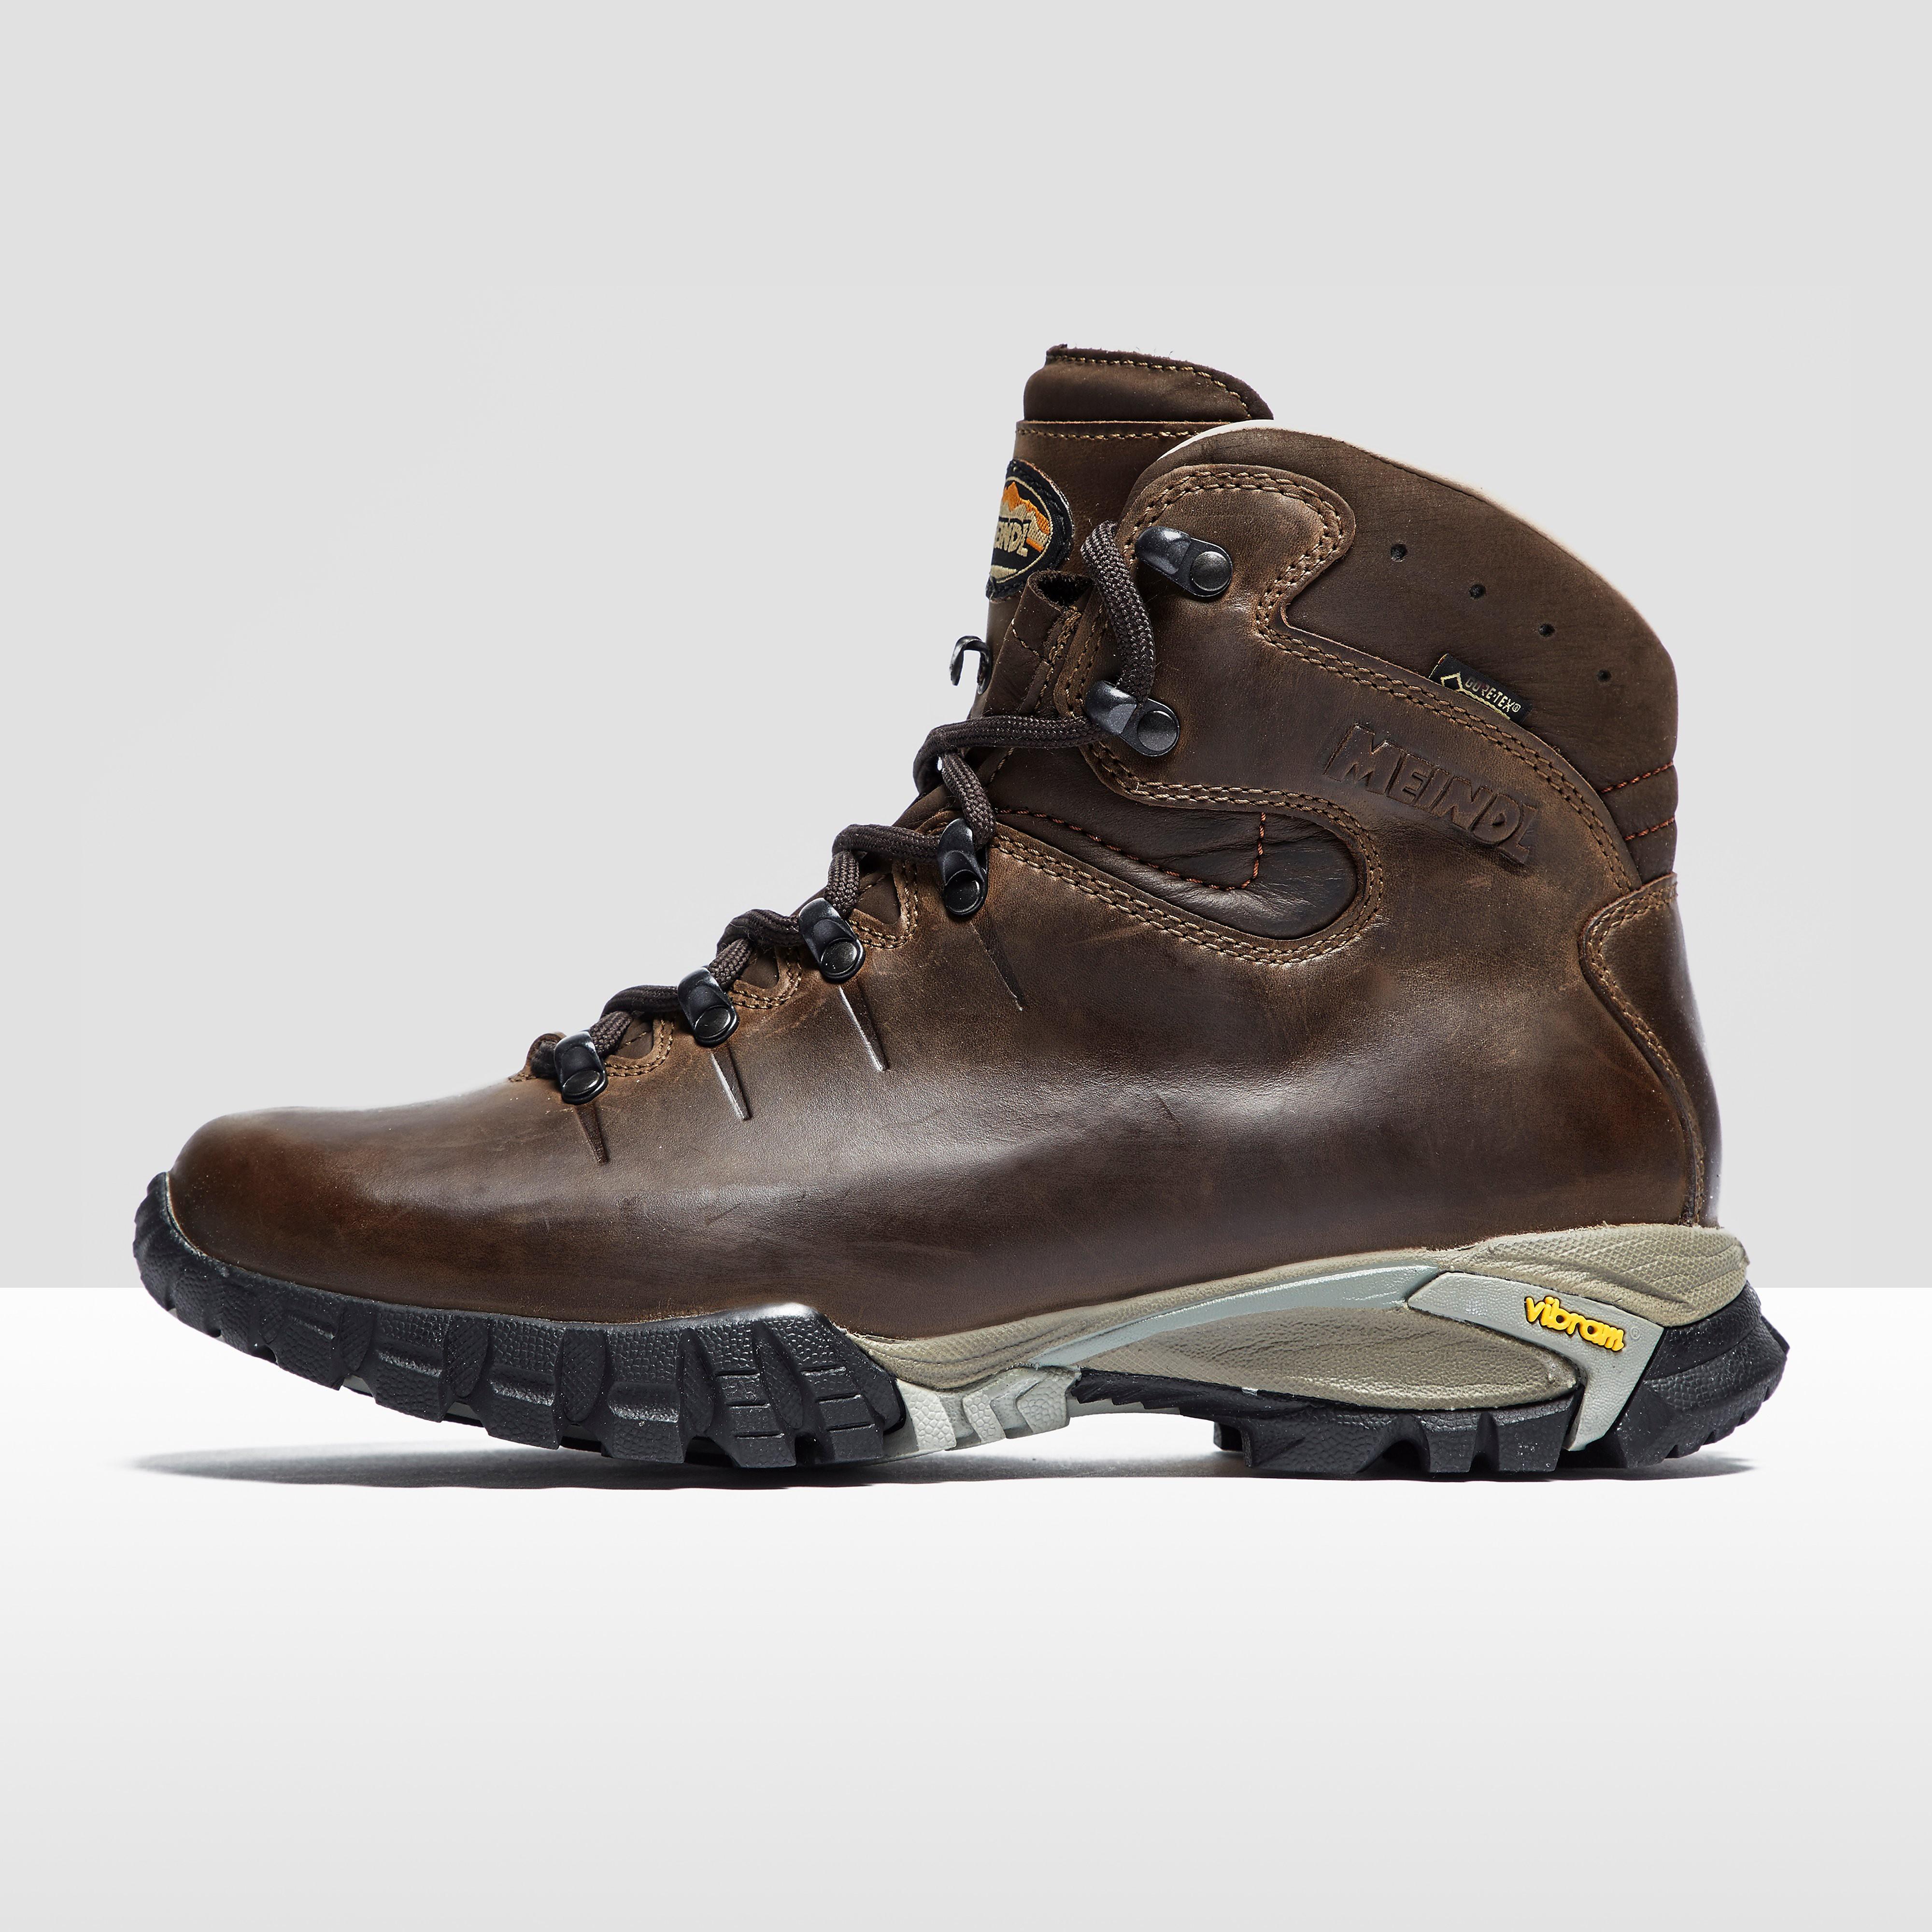 Meindl Toronto GTX Women's Walking Boots